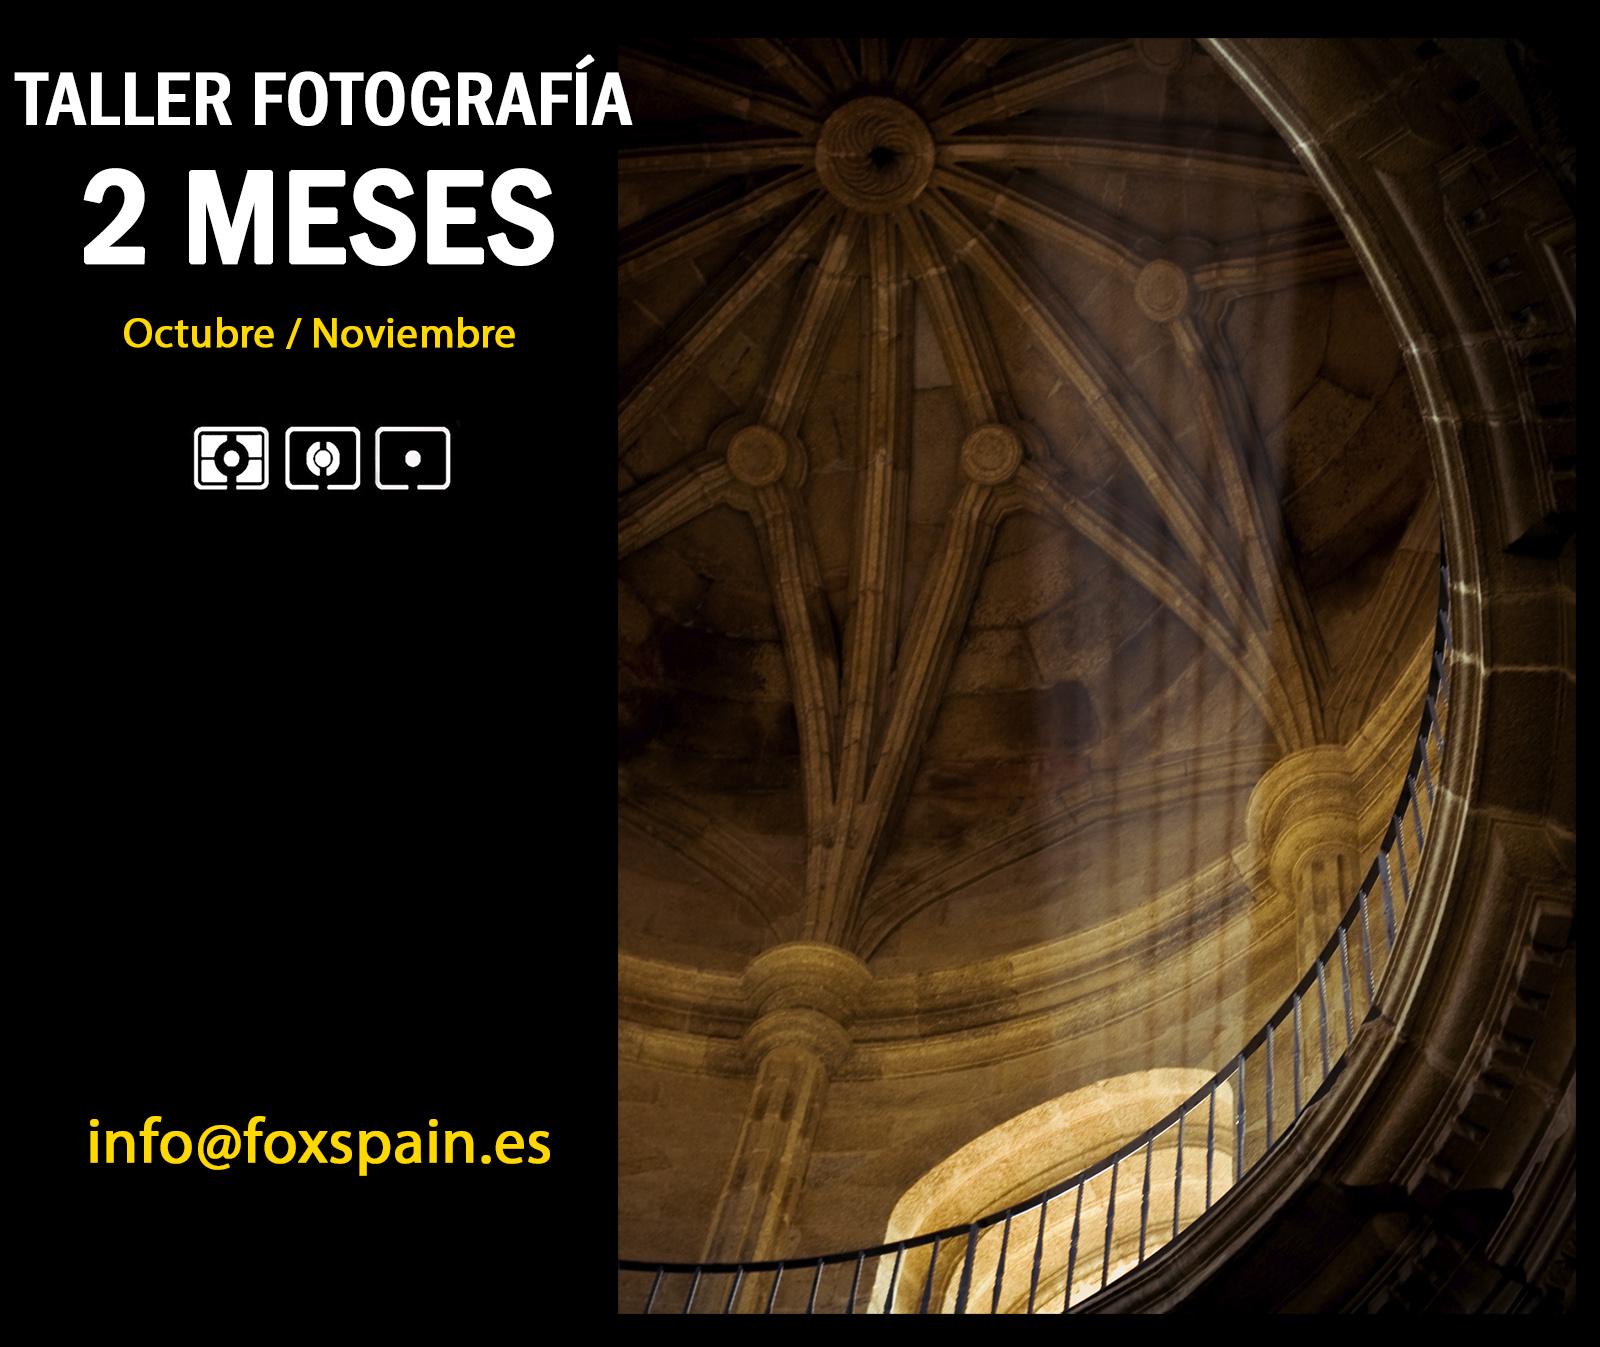 Taller de Fotografía 2 Meses en Vigo / Octubre - Noviembre 2018 ...